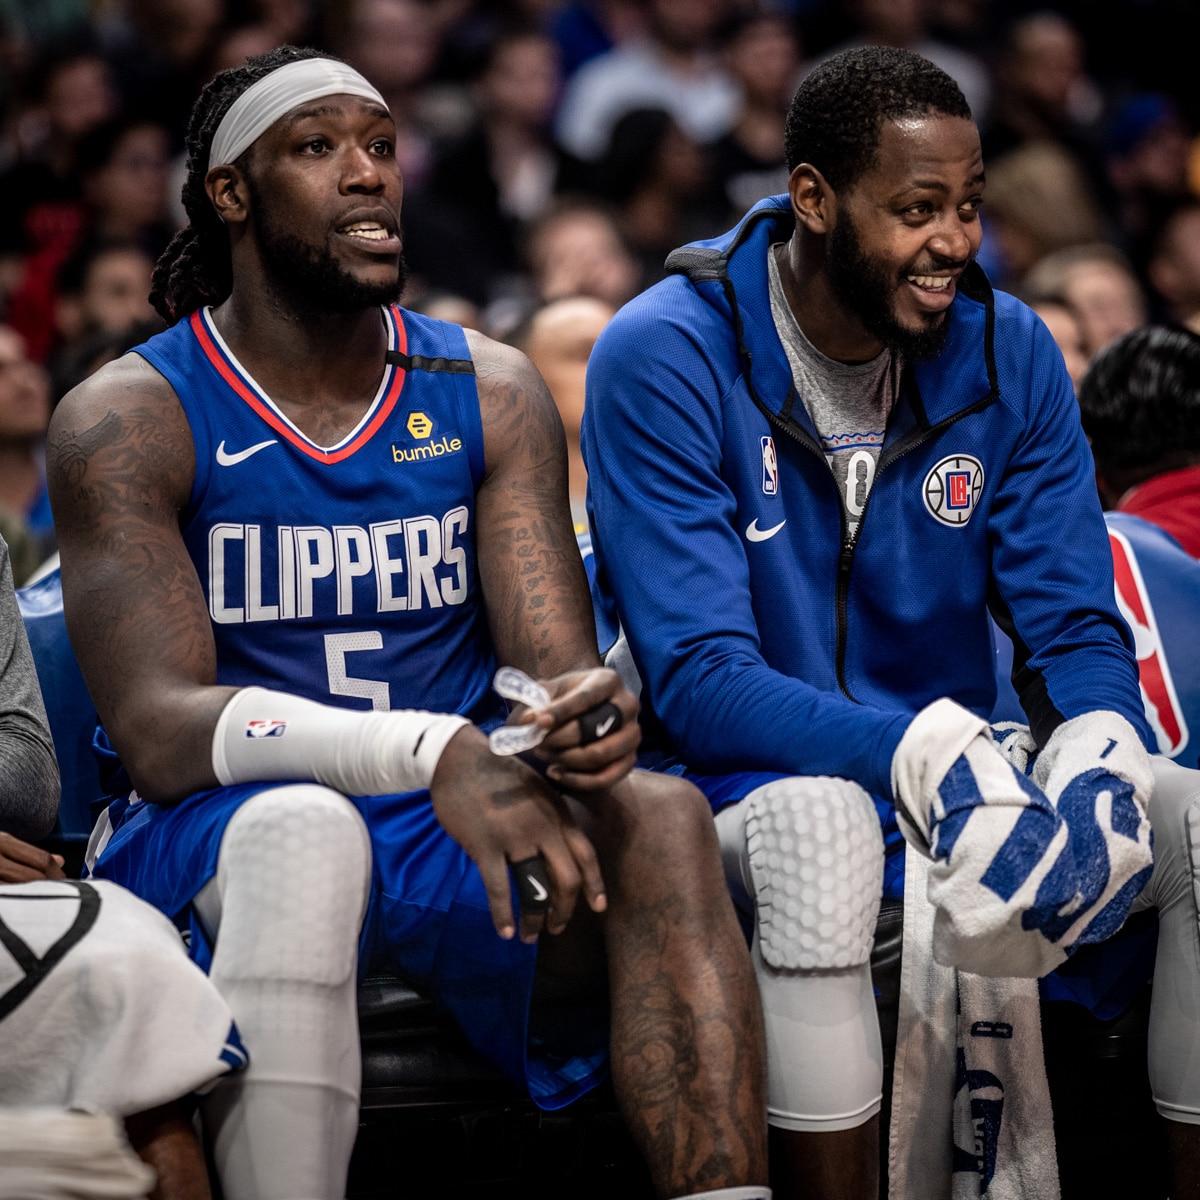 Clippers to Sign Joakim Noah Through 2021